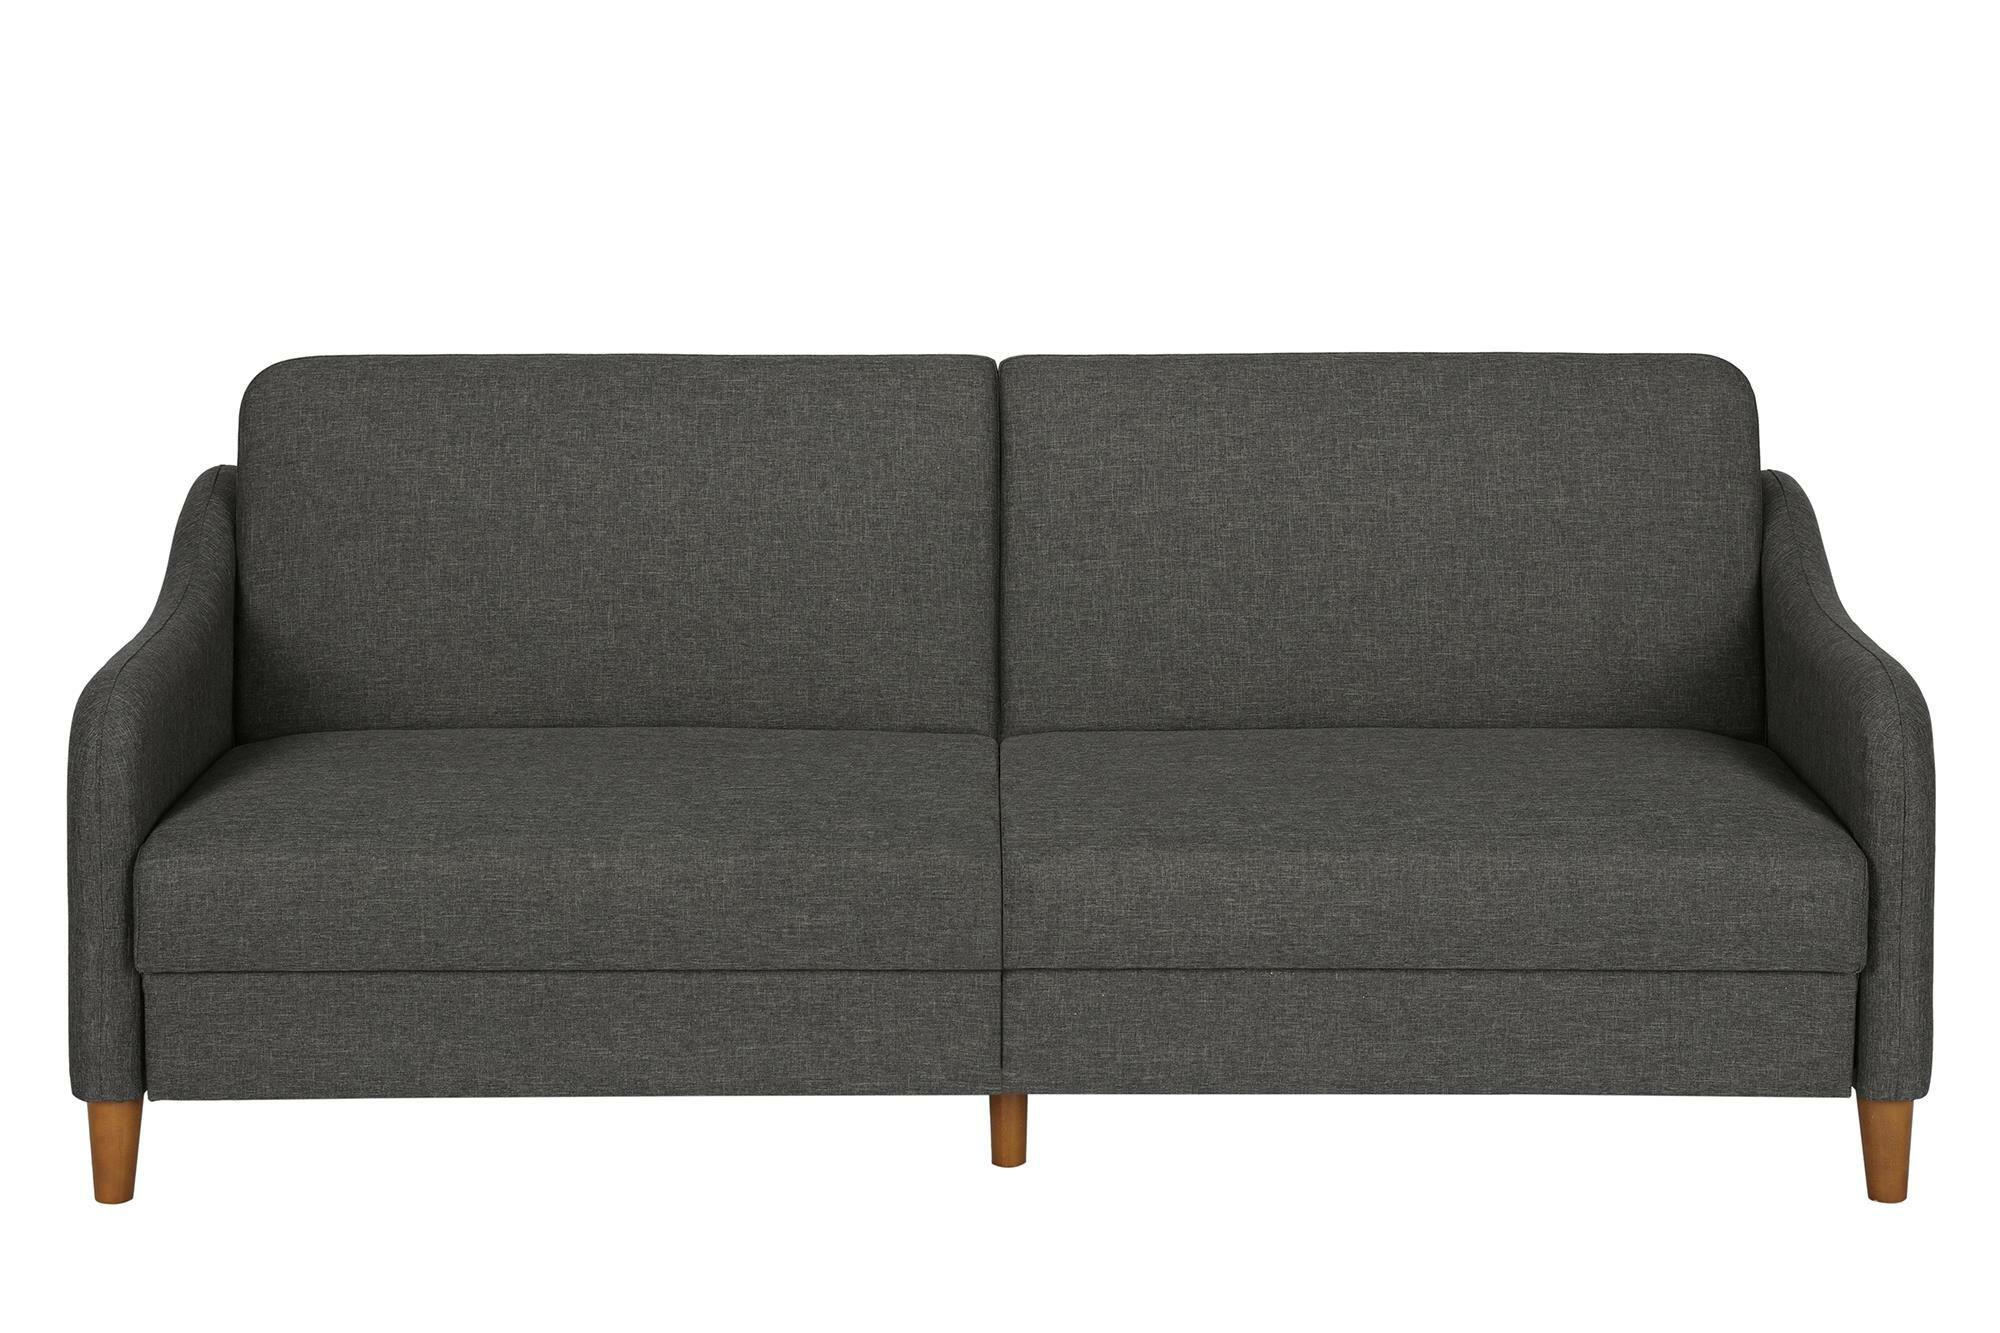 Brilliant Tulsa Convertible Sleeper Sofa Interior Design Ideas Helimdqseriescom